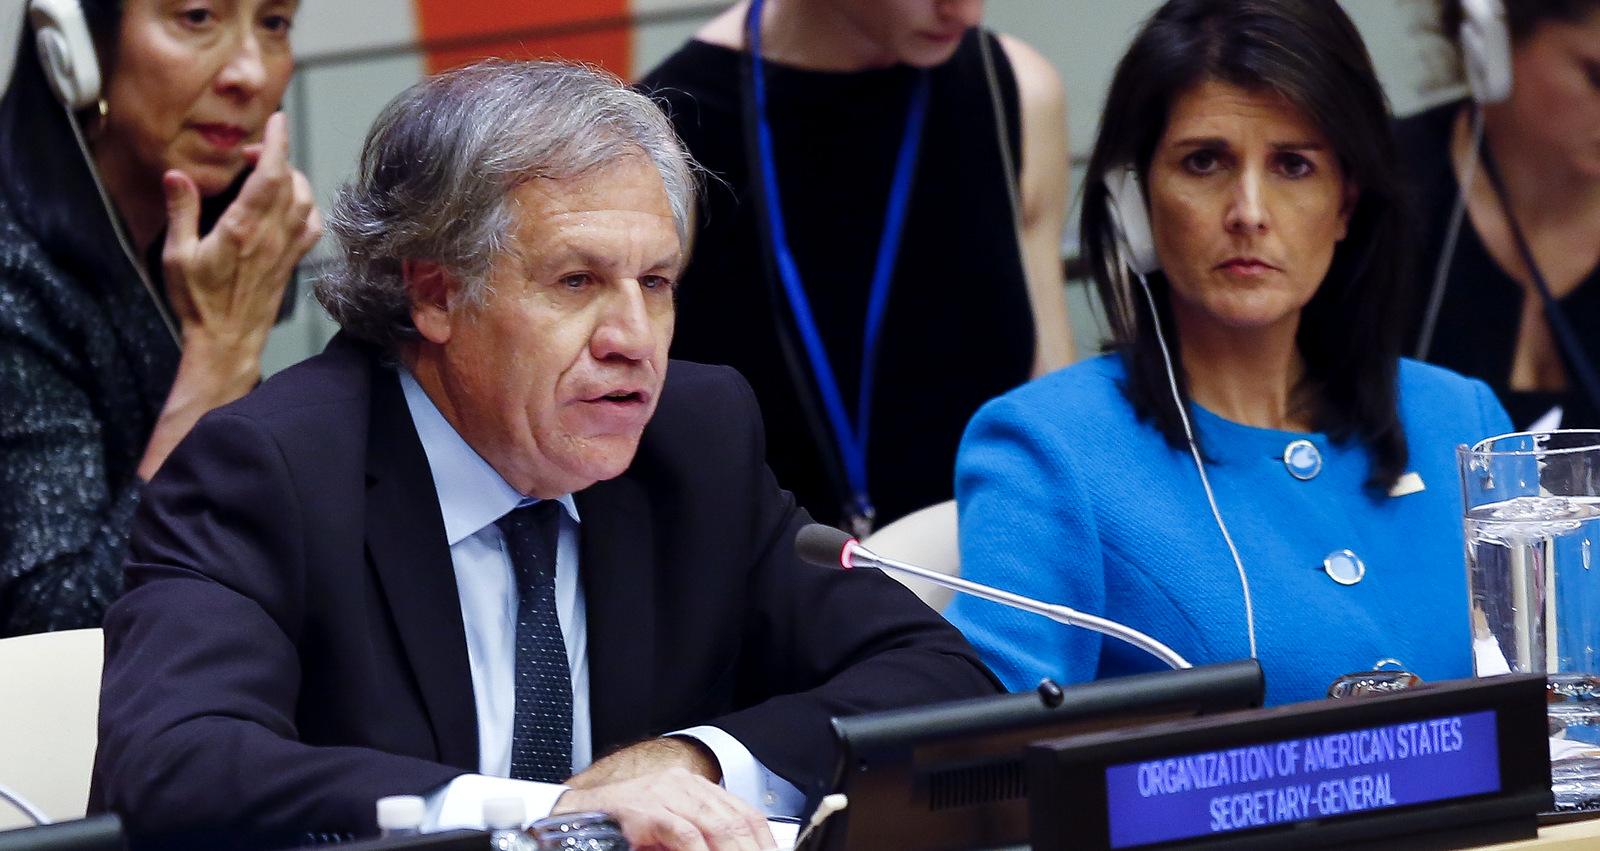 The ICC Plays Scripted Role in Regime Change Plot Against Venezuela